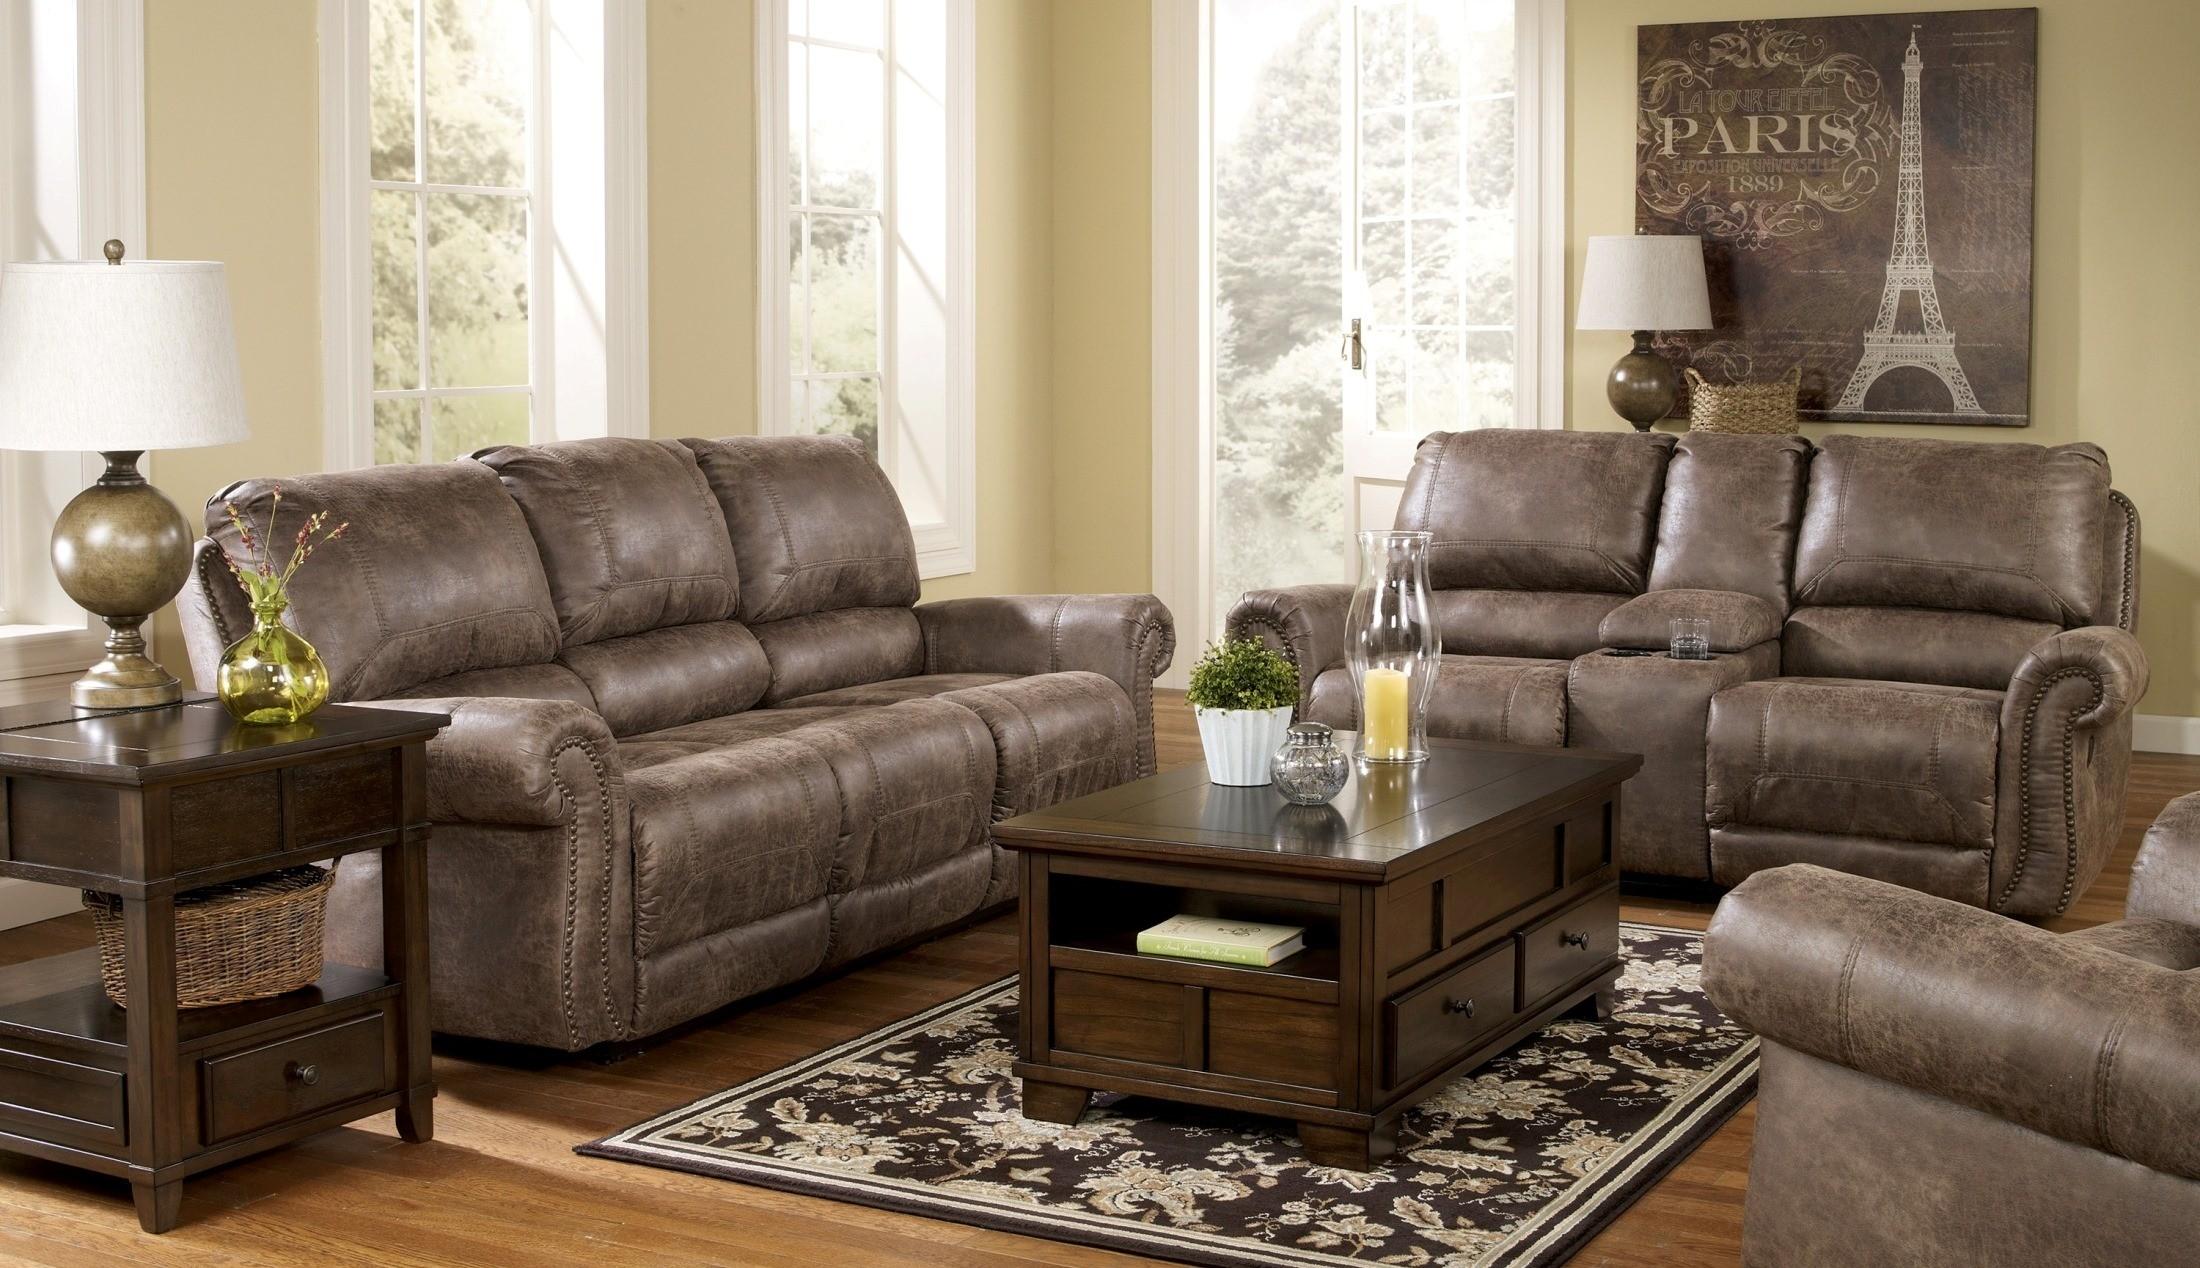 oberson gunsmoke power reclining living room set from ashley 74100 coleman furniture